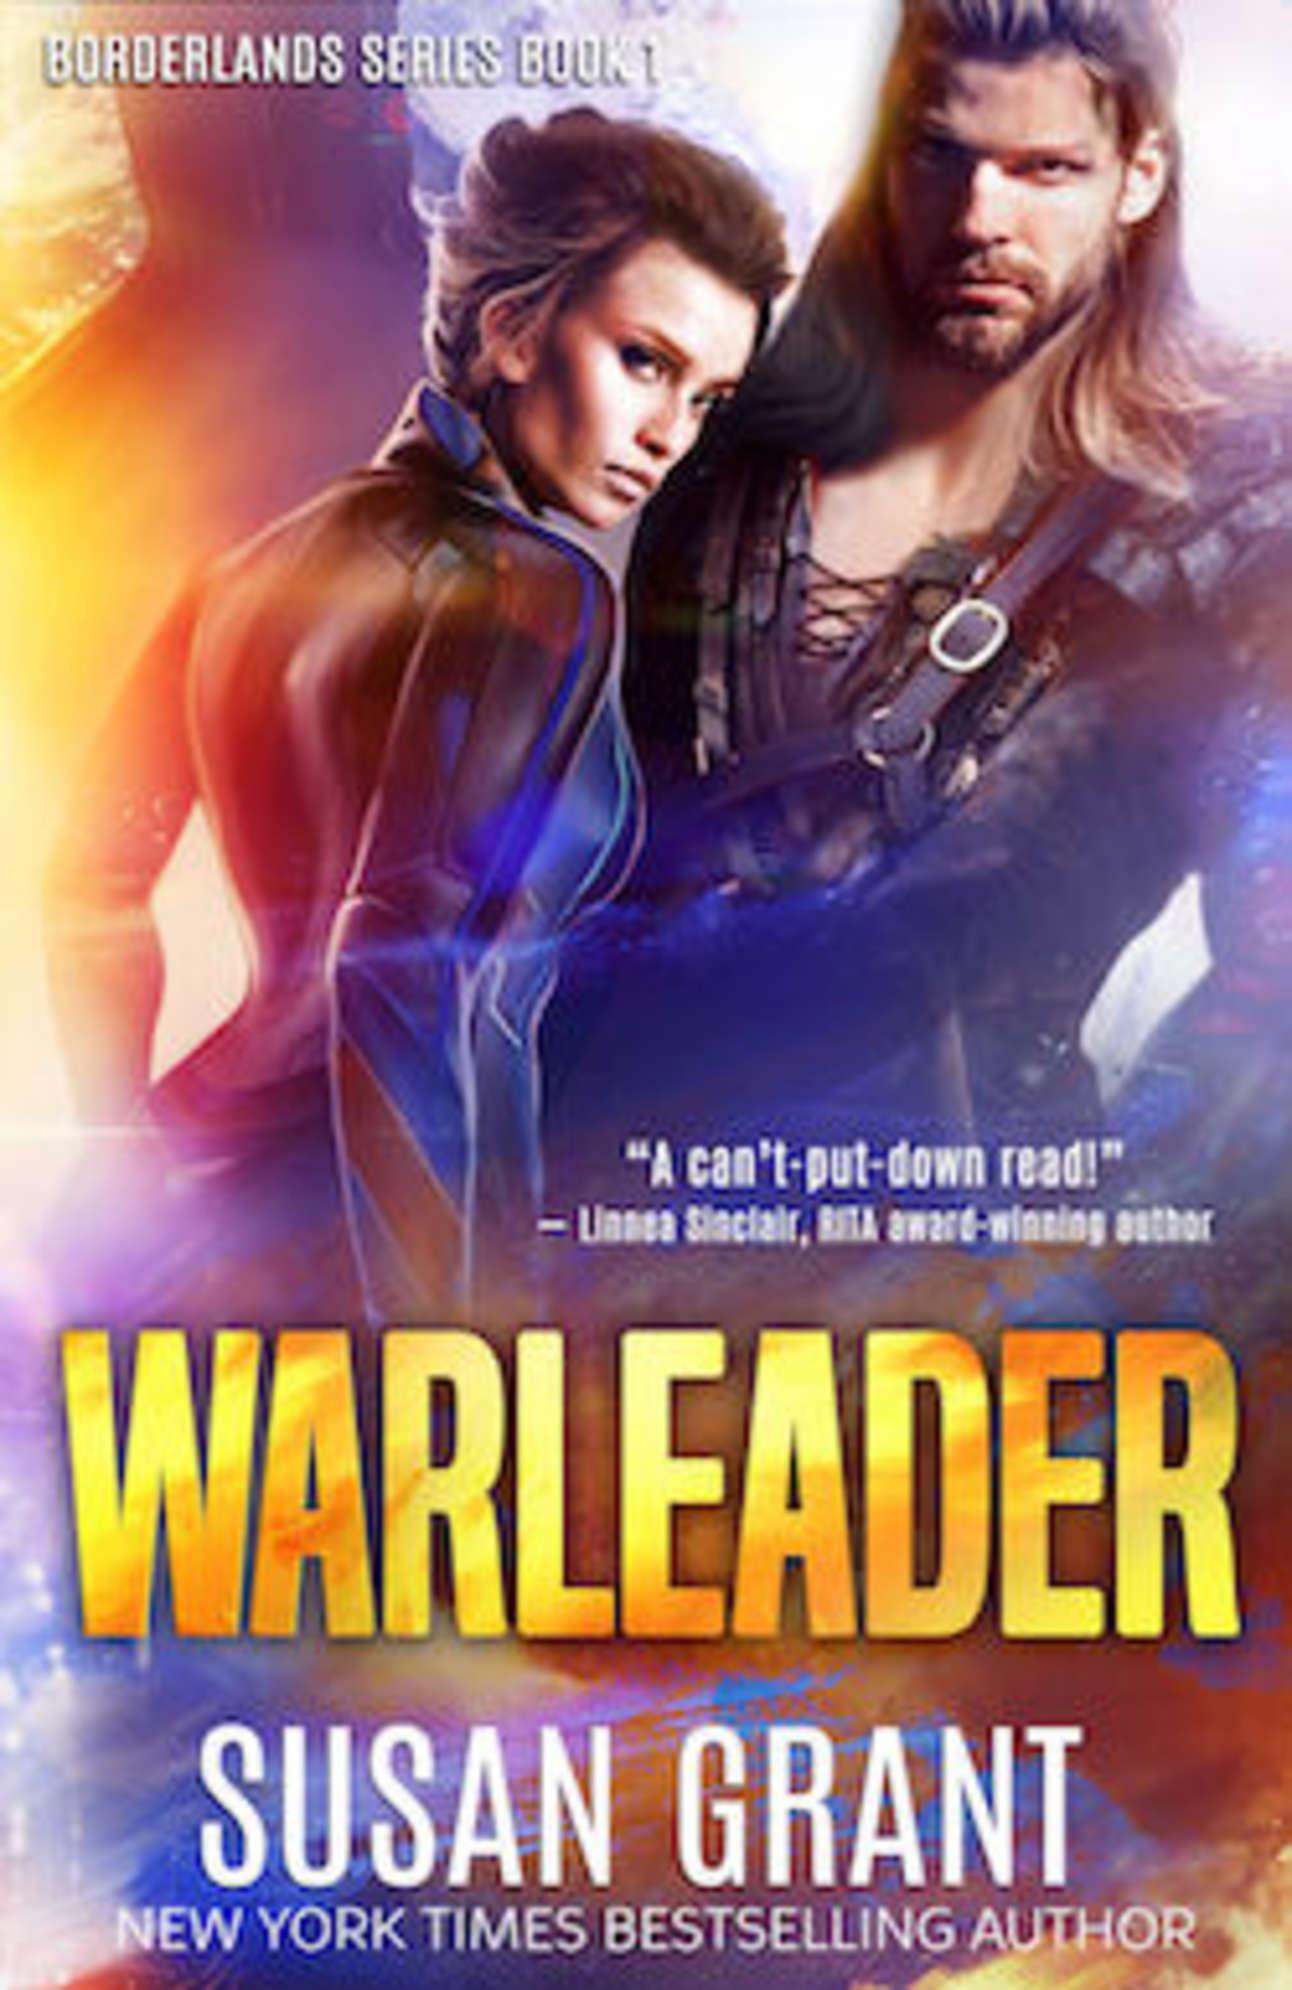 Warleader